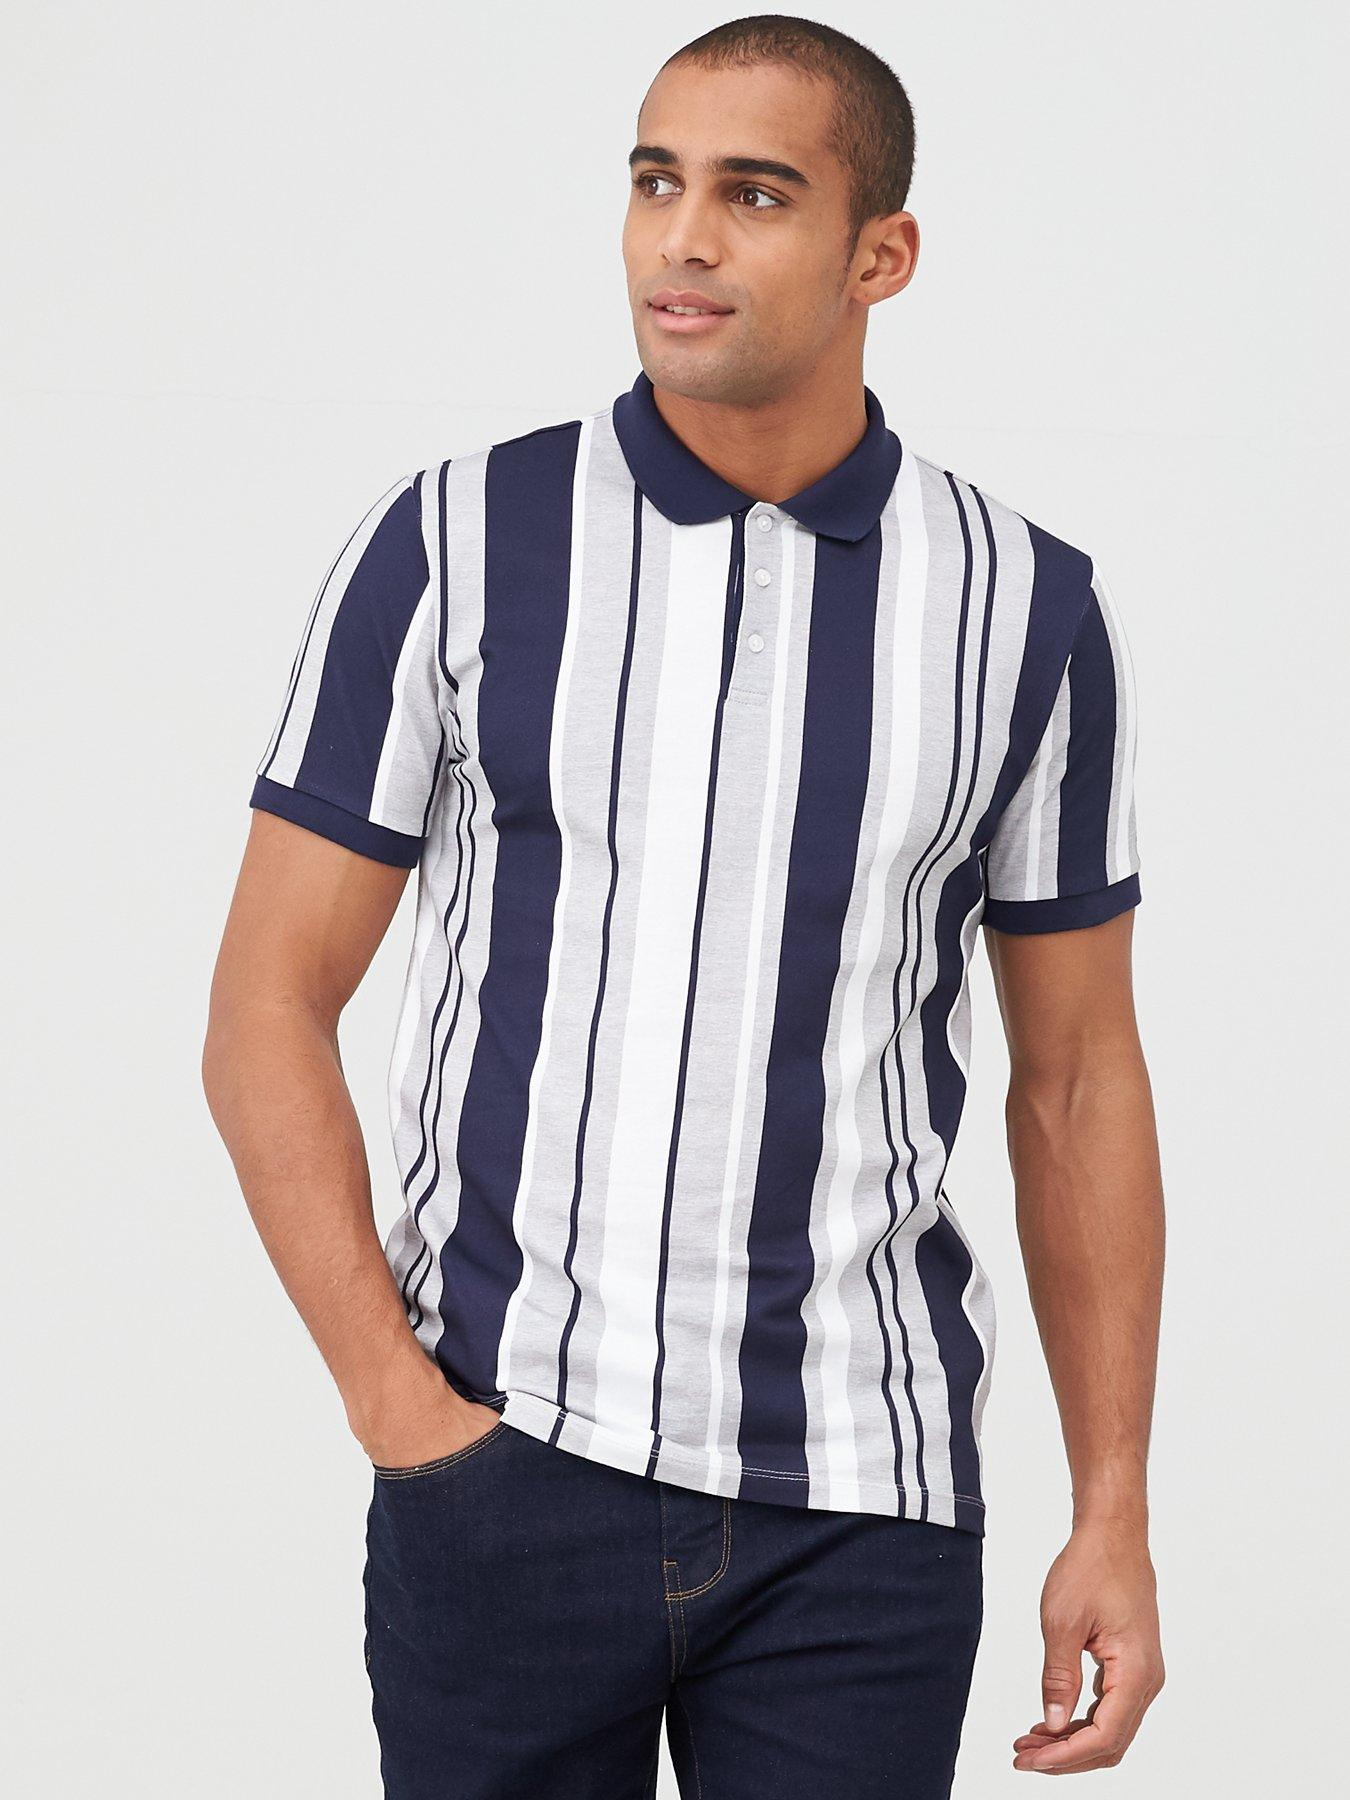 BOLF Mens Shirts Long Sleeve Casual Slim Fit Smart Formal Striped 2B2 Bussines